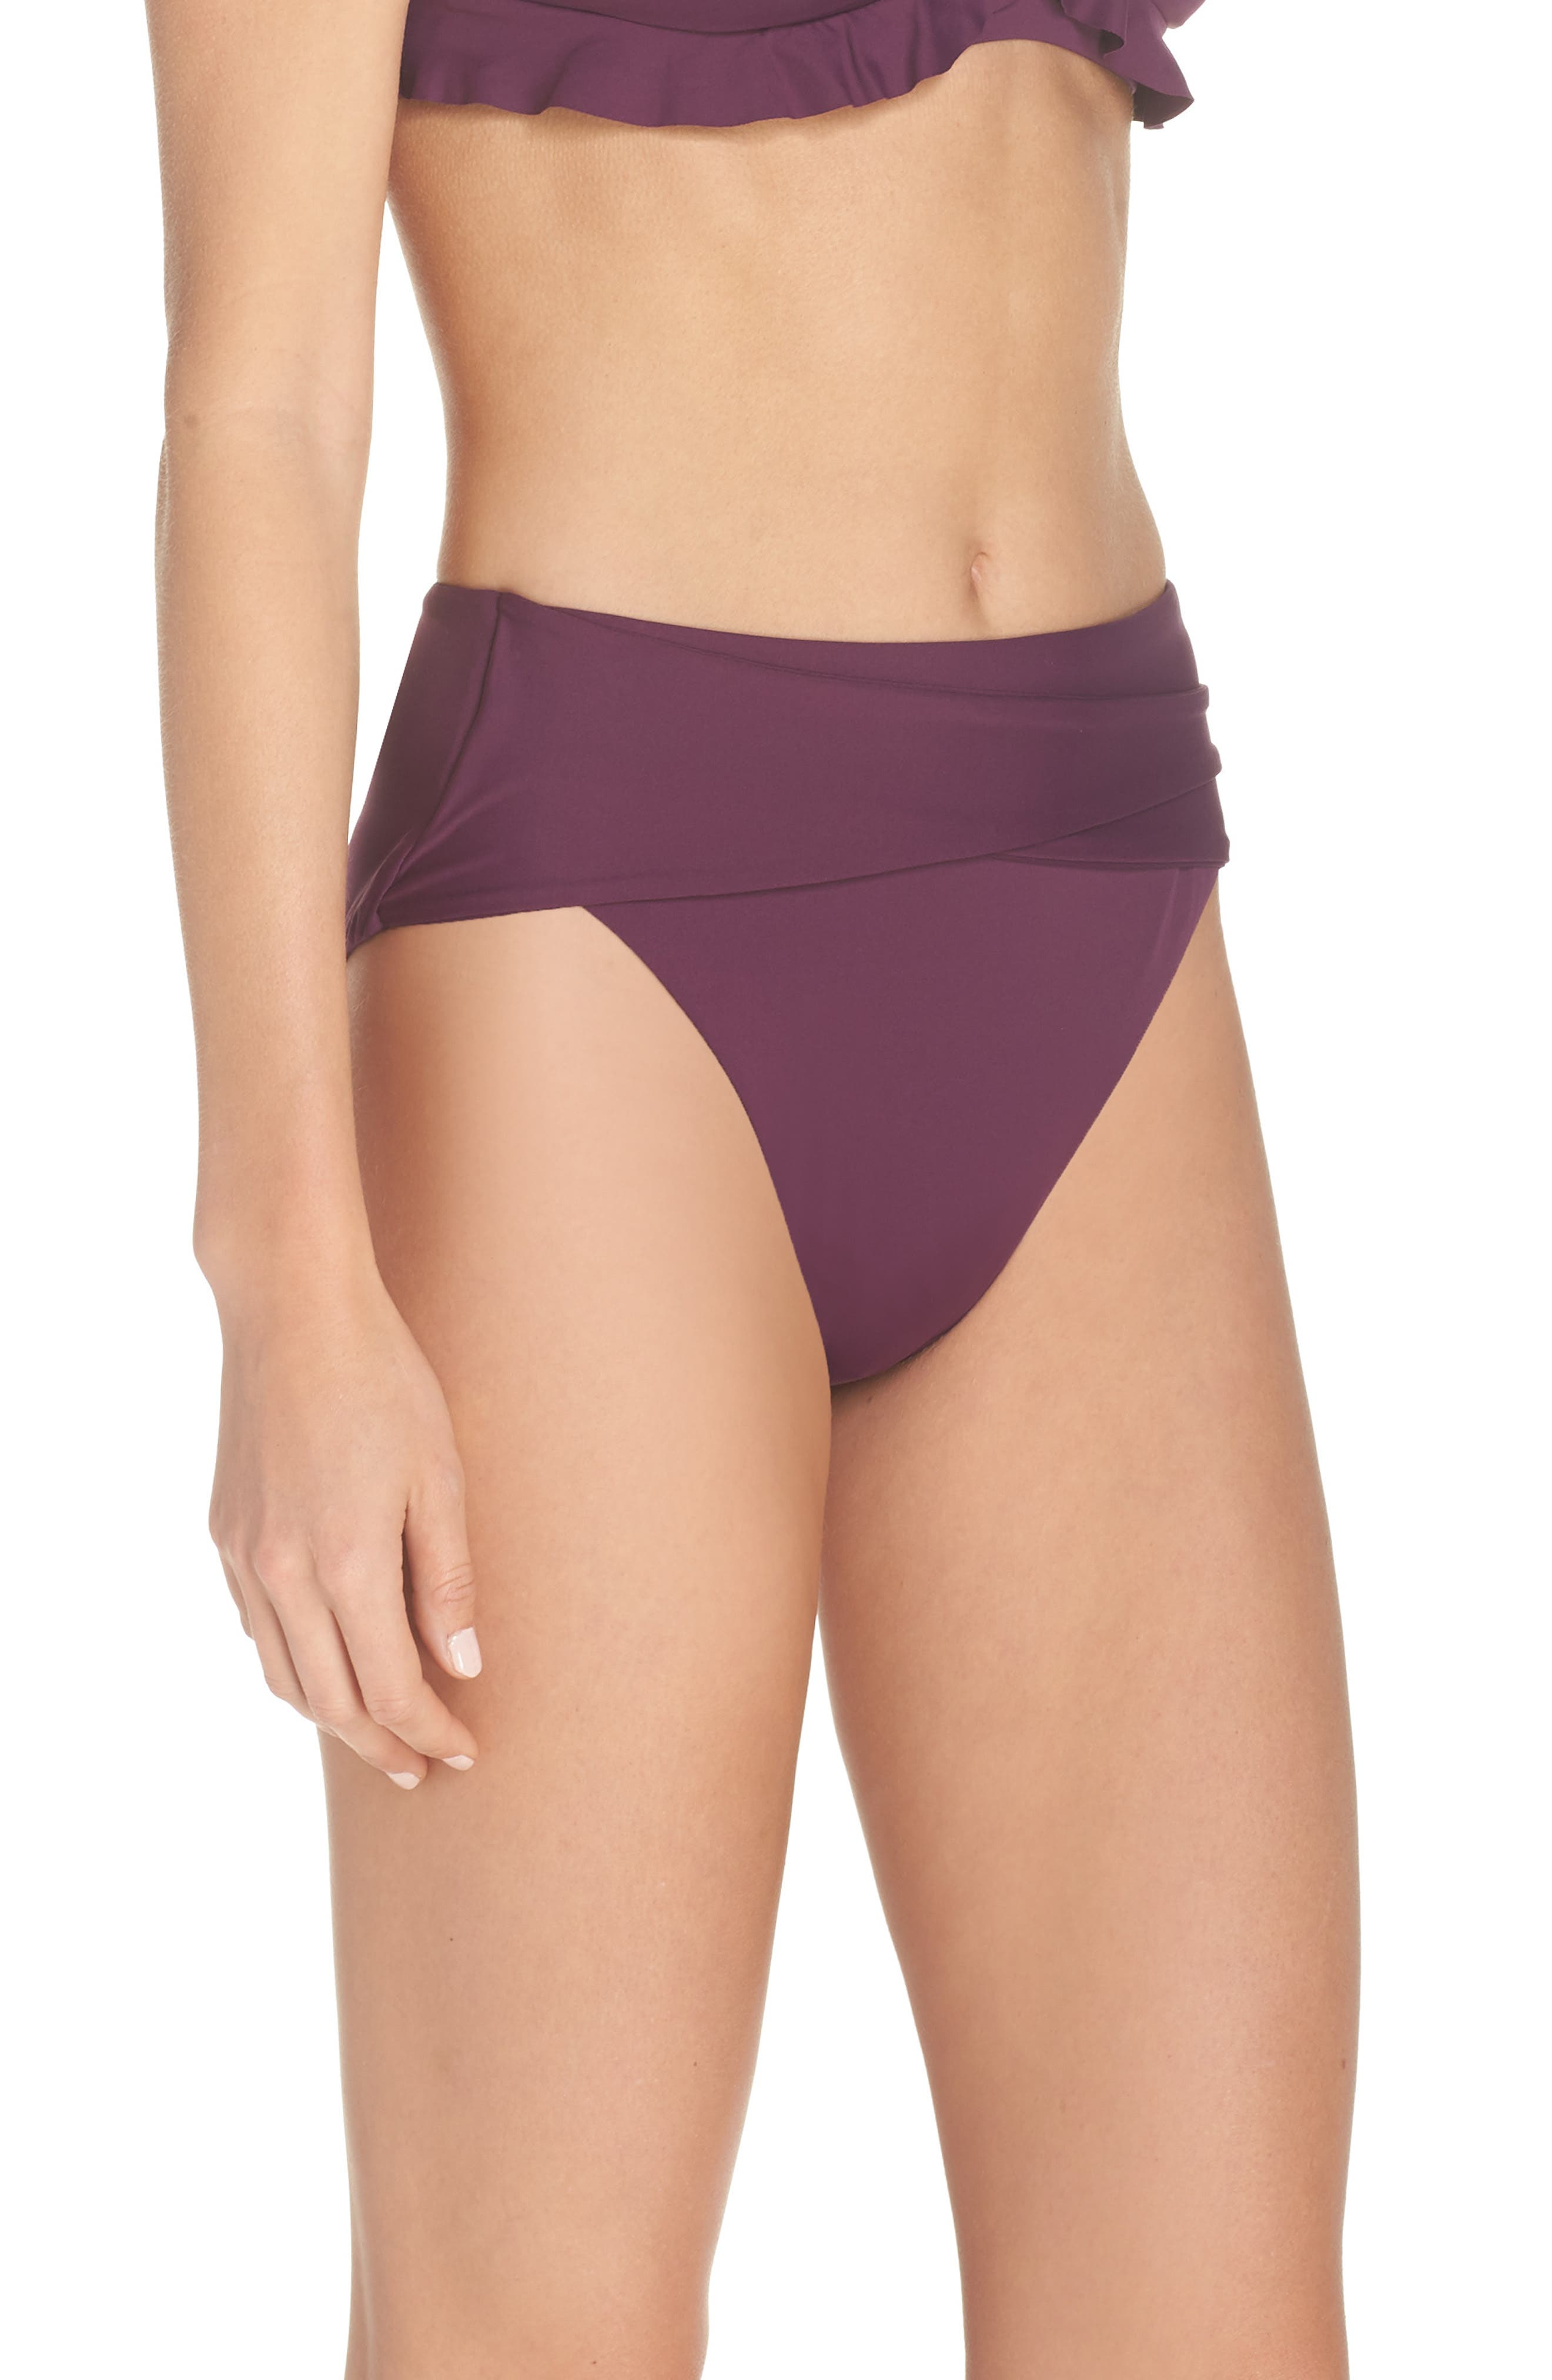 BECCA, Color Code Crossover High Waist Bikini Bottoms, Alternate thumbnail 4, color, MERLOT